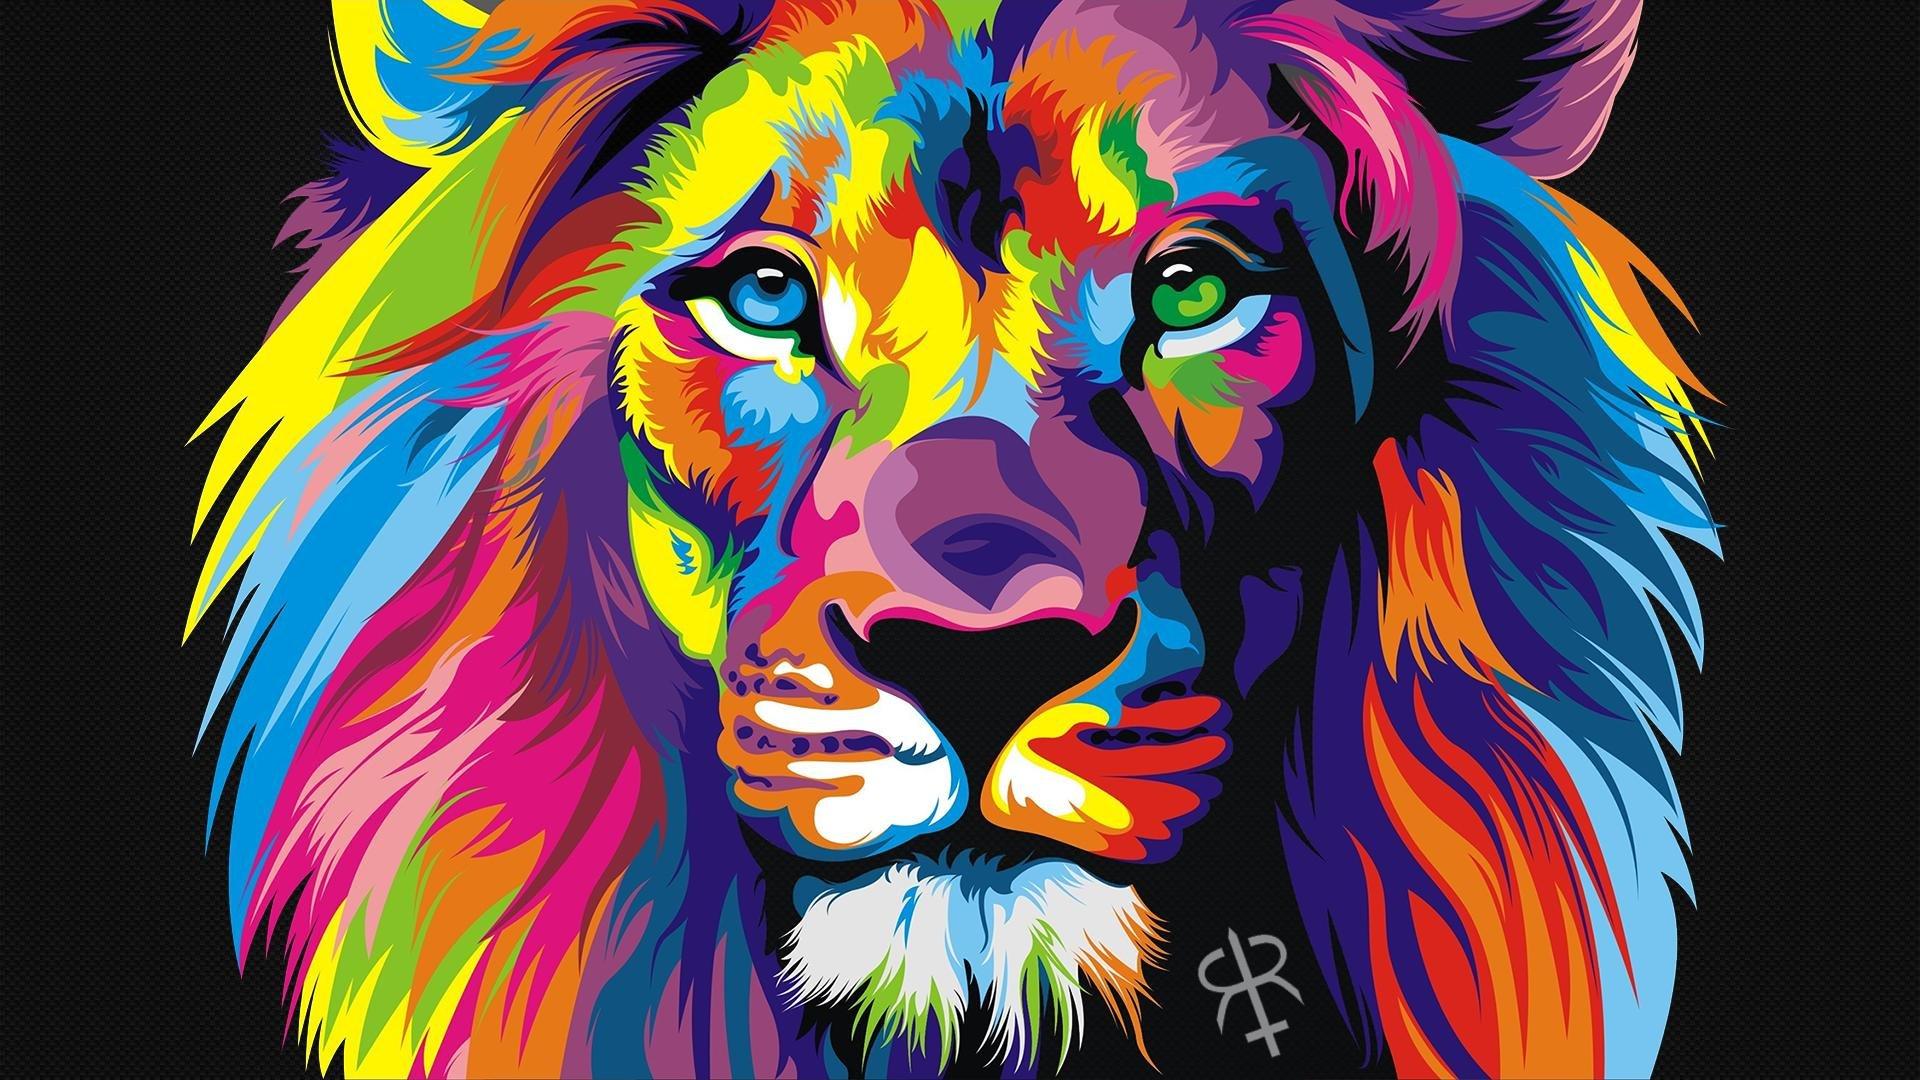 Colorful Lion Hd Wallpaper